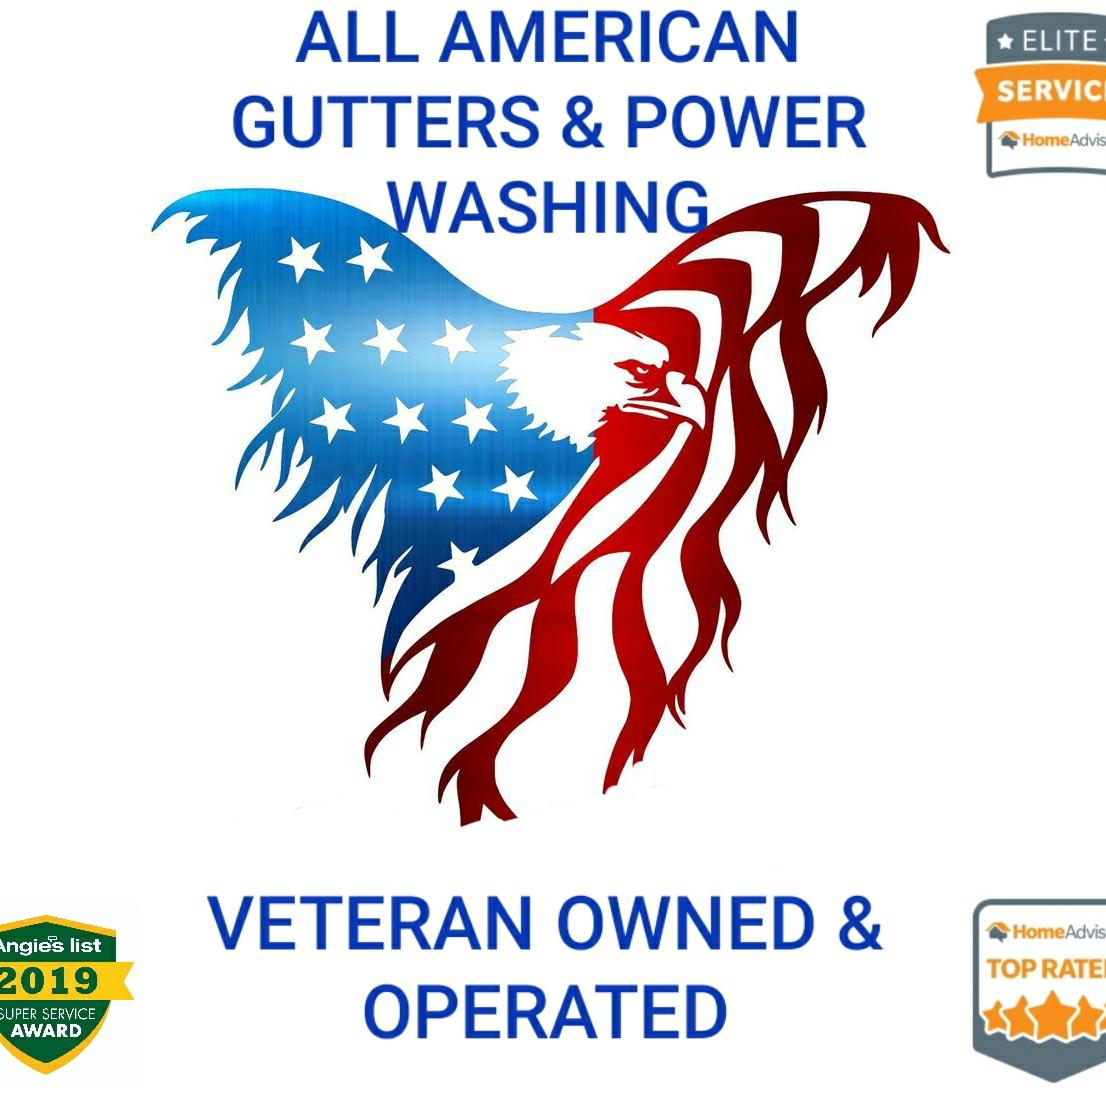 All American Gutters & Power Washing logo